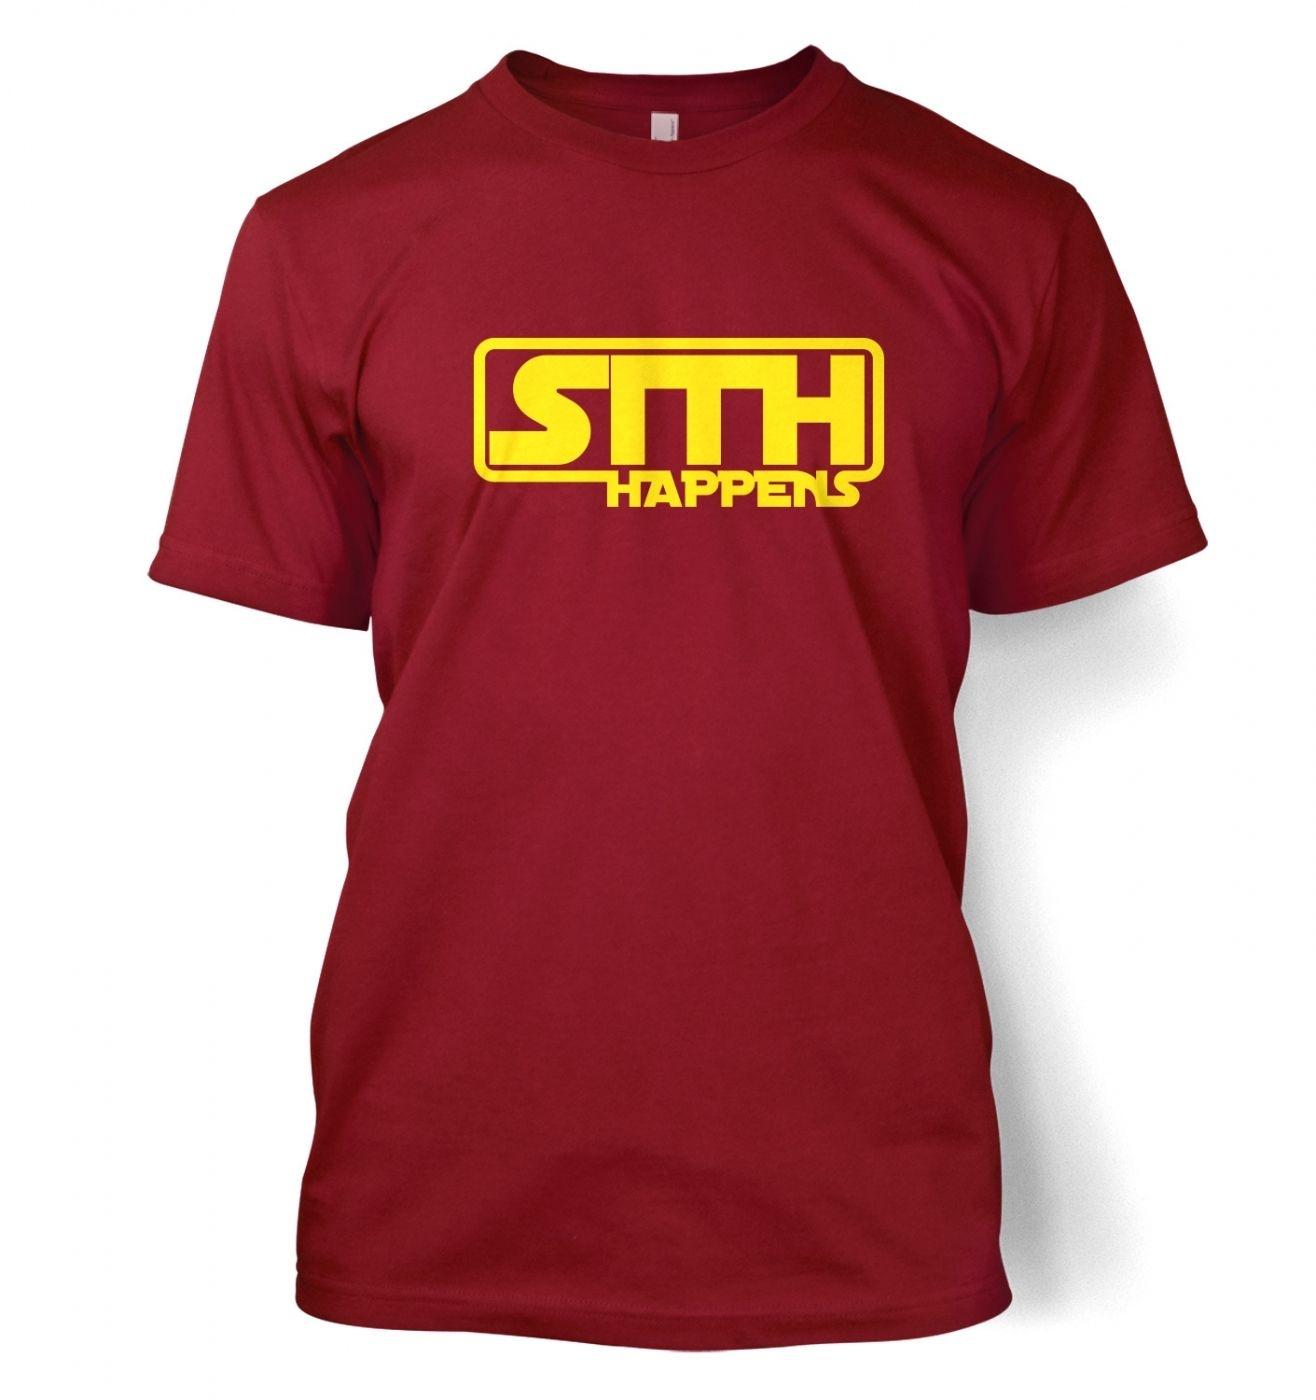 Sith Happens Adult T shirt